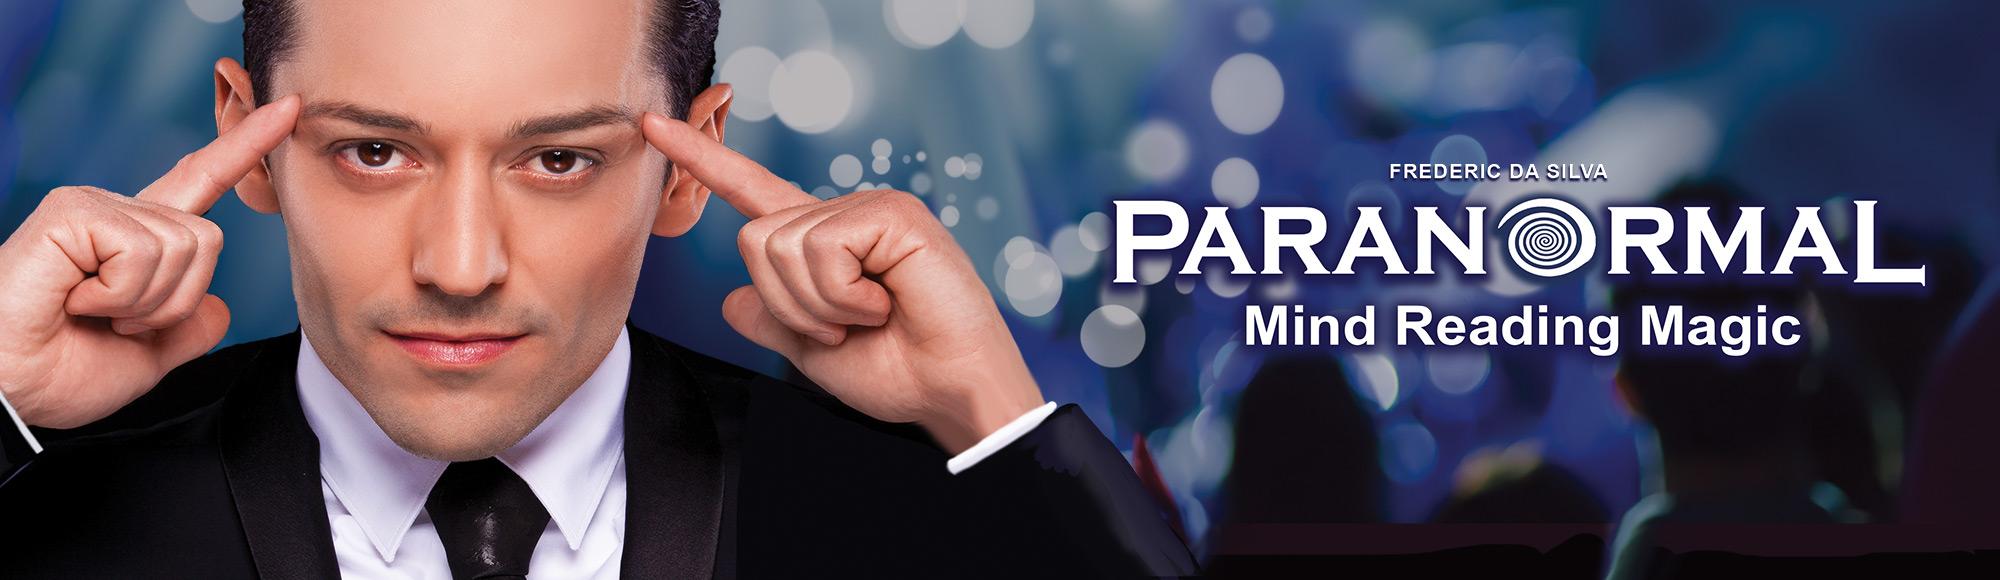 Paranormal Mind Reading Magic Show Las Vegas: Tickets